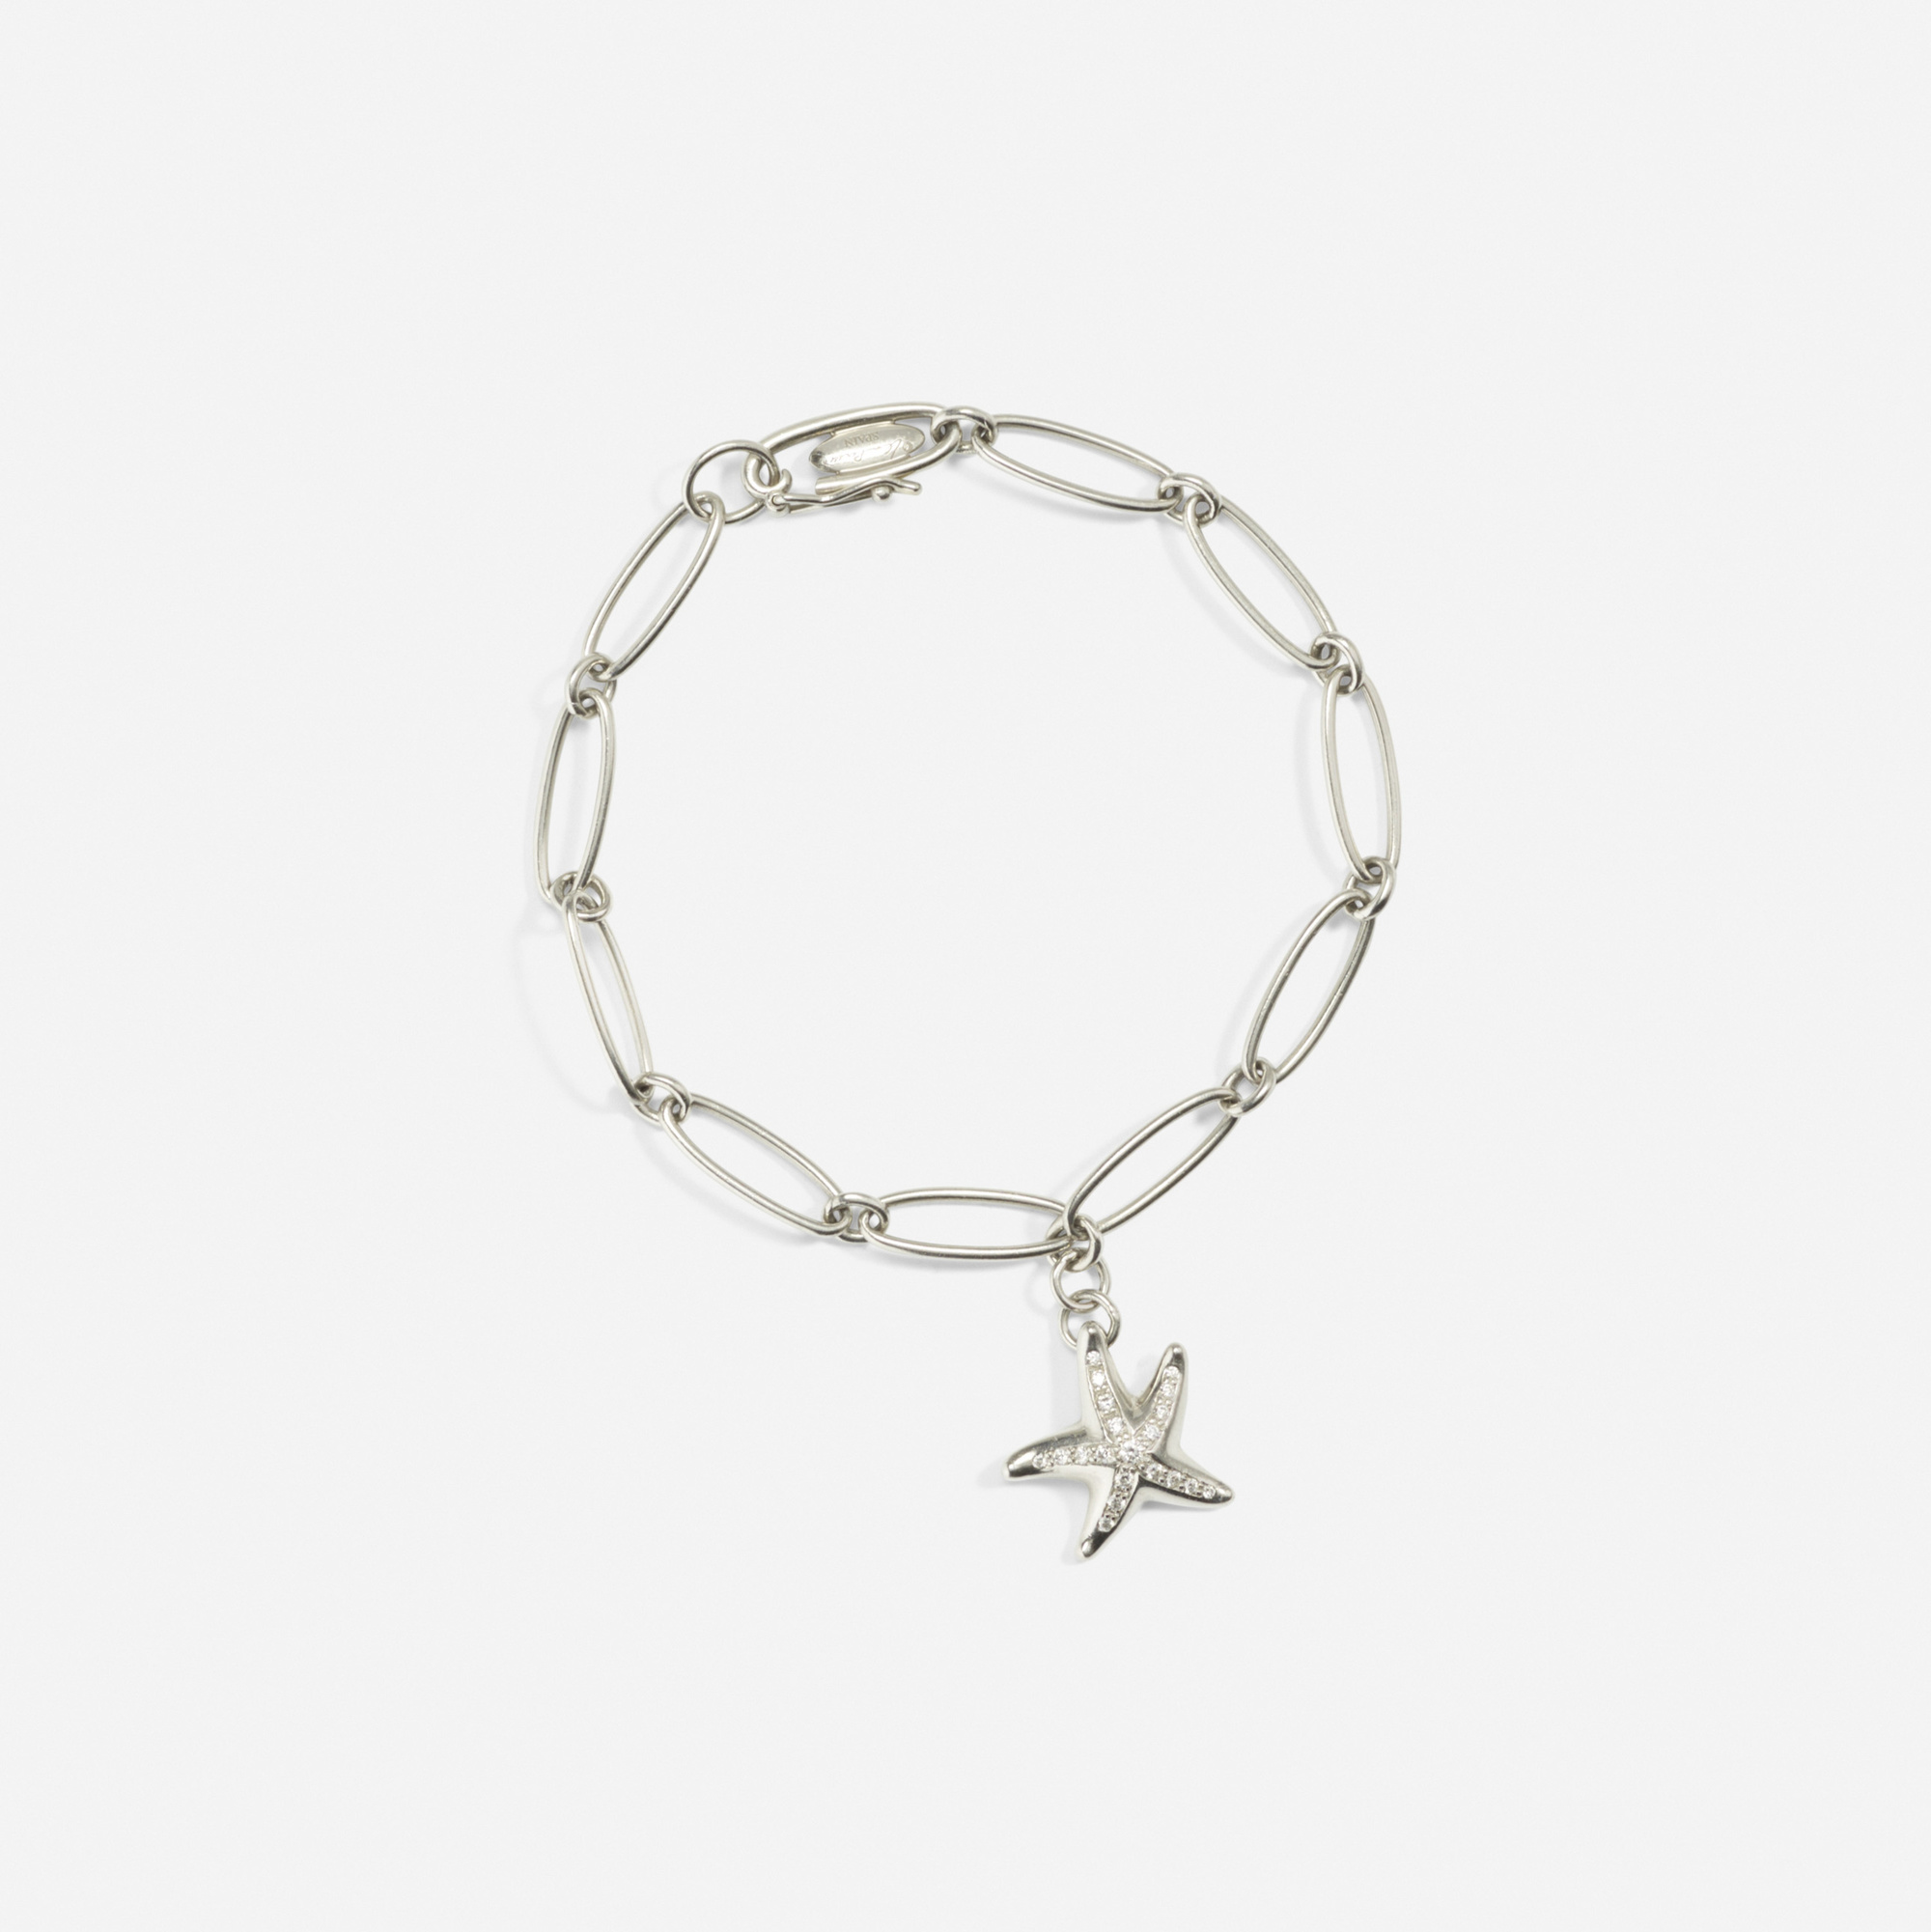 228: Tiffany & Co. / A platinum and diamond bracelet (1 of 2)